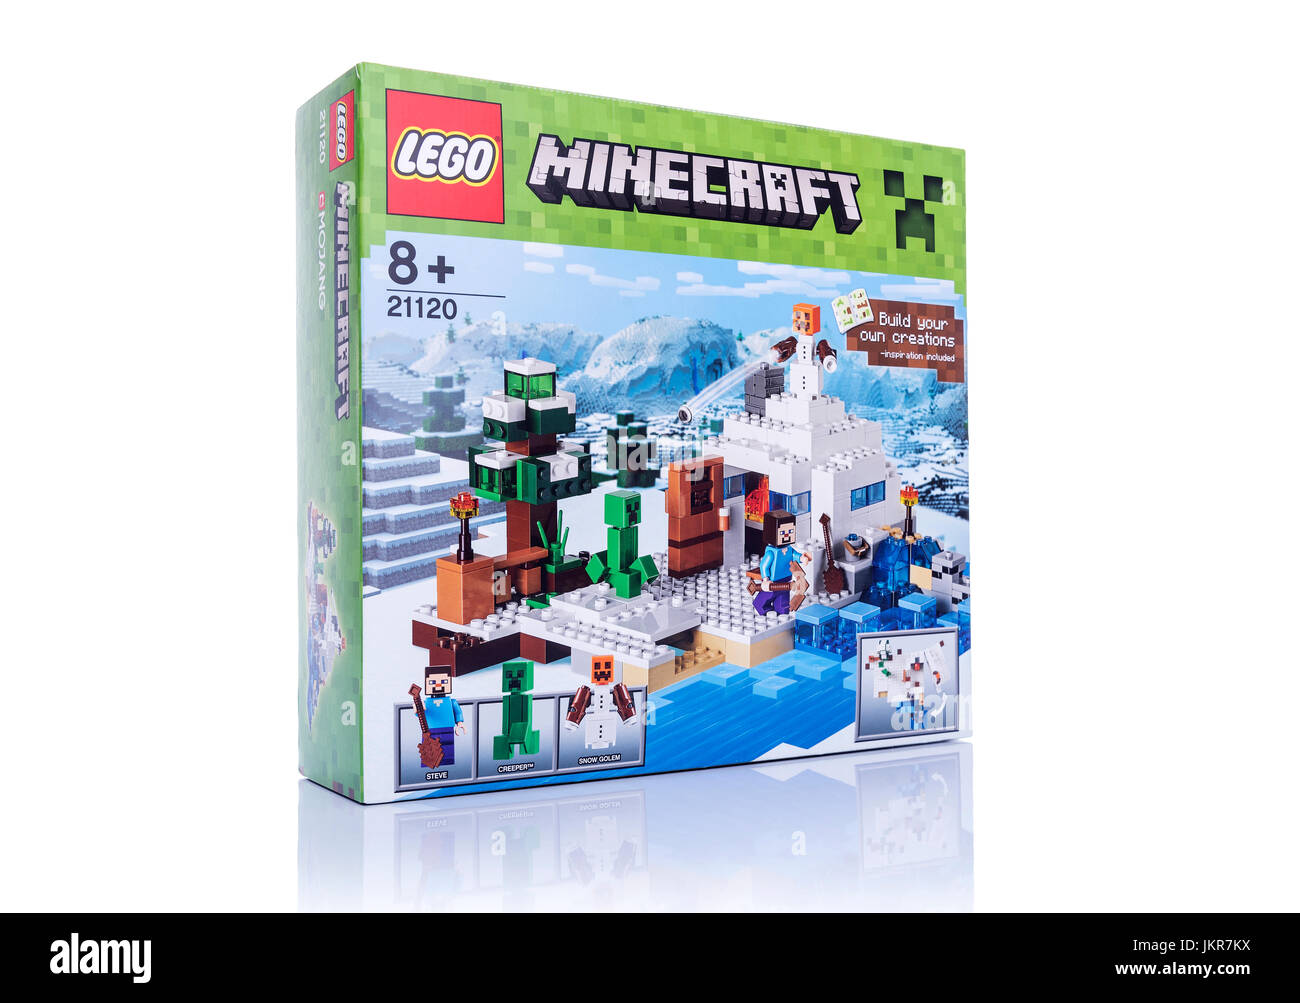 Computer game Minecraft. Editorial, illustration. - Stock Image